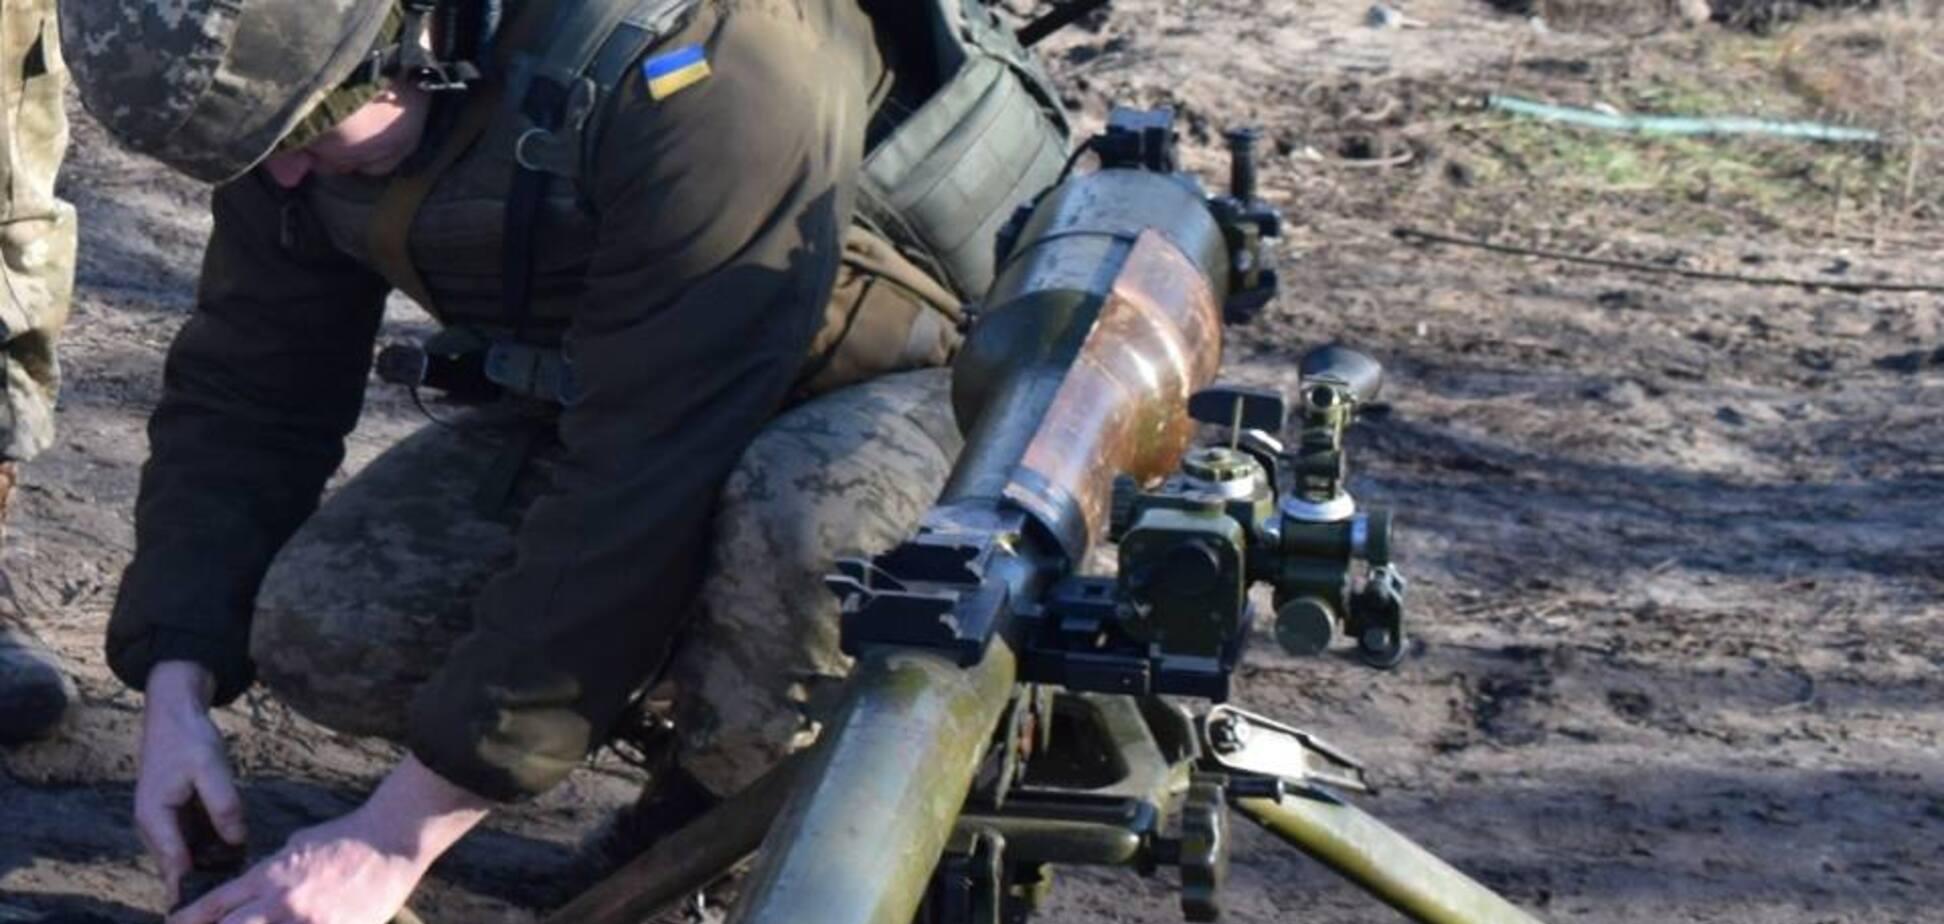 Прекращения огня нет: террористы ранили бойца АТО на Донбассе